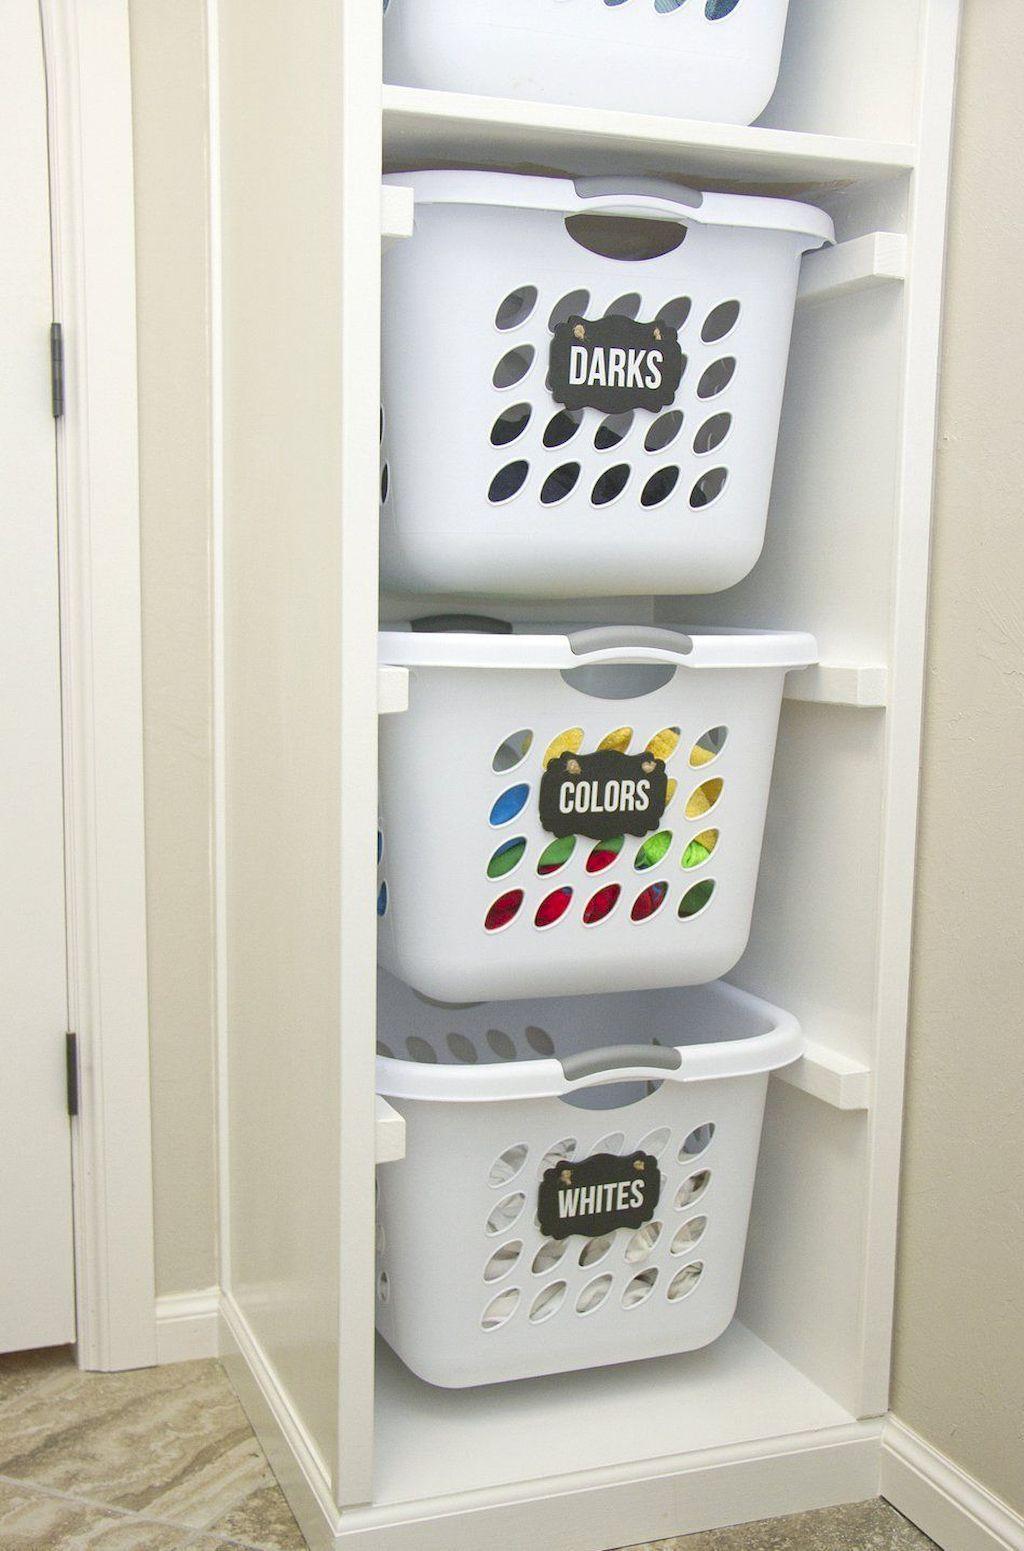 10 Smart Laundry Room Organization Ideas Waschküchenorganisation Diy Waschküche Diy Wäschekorb